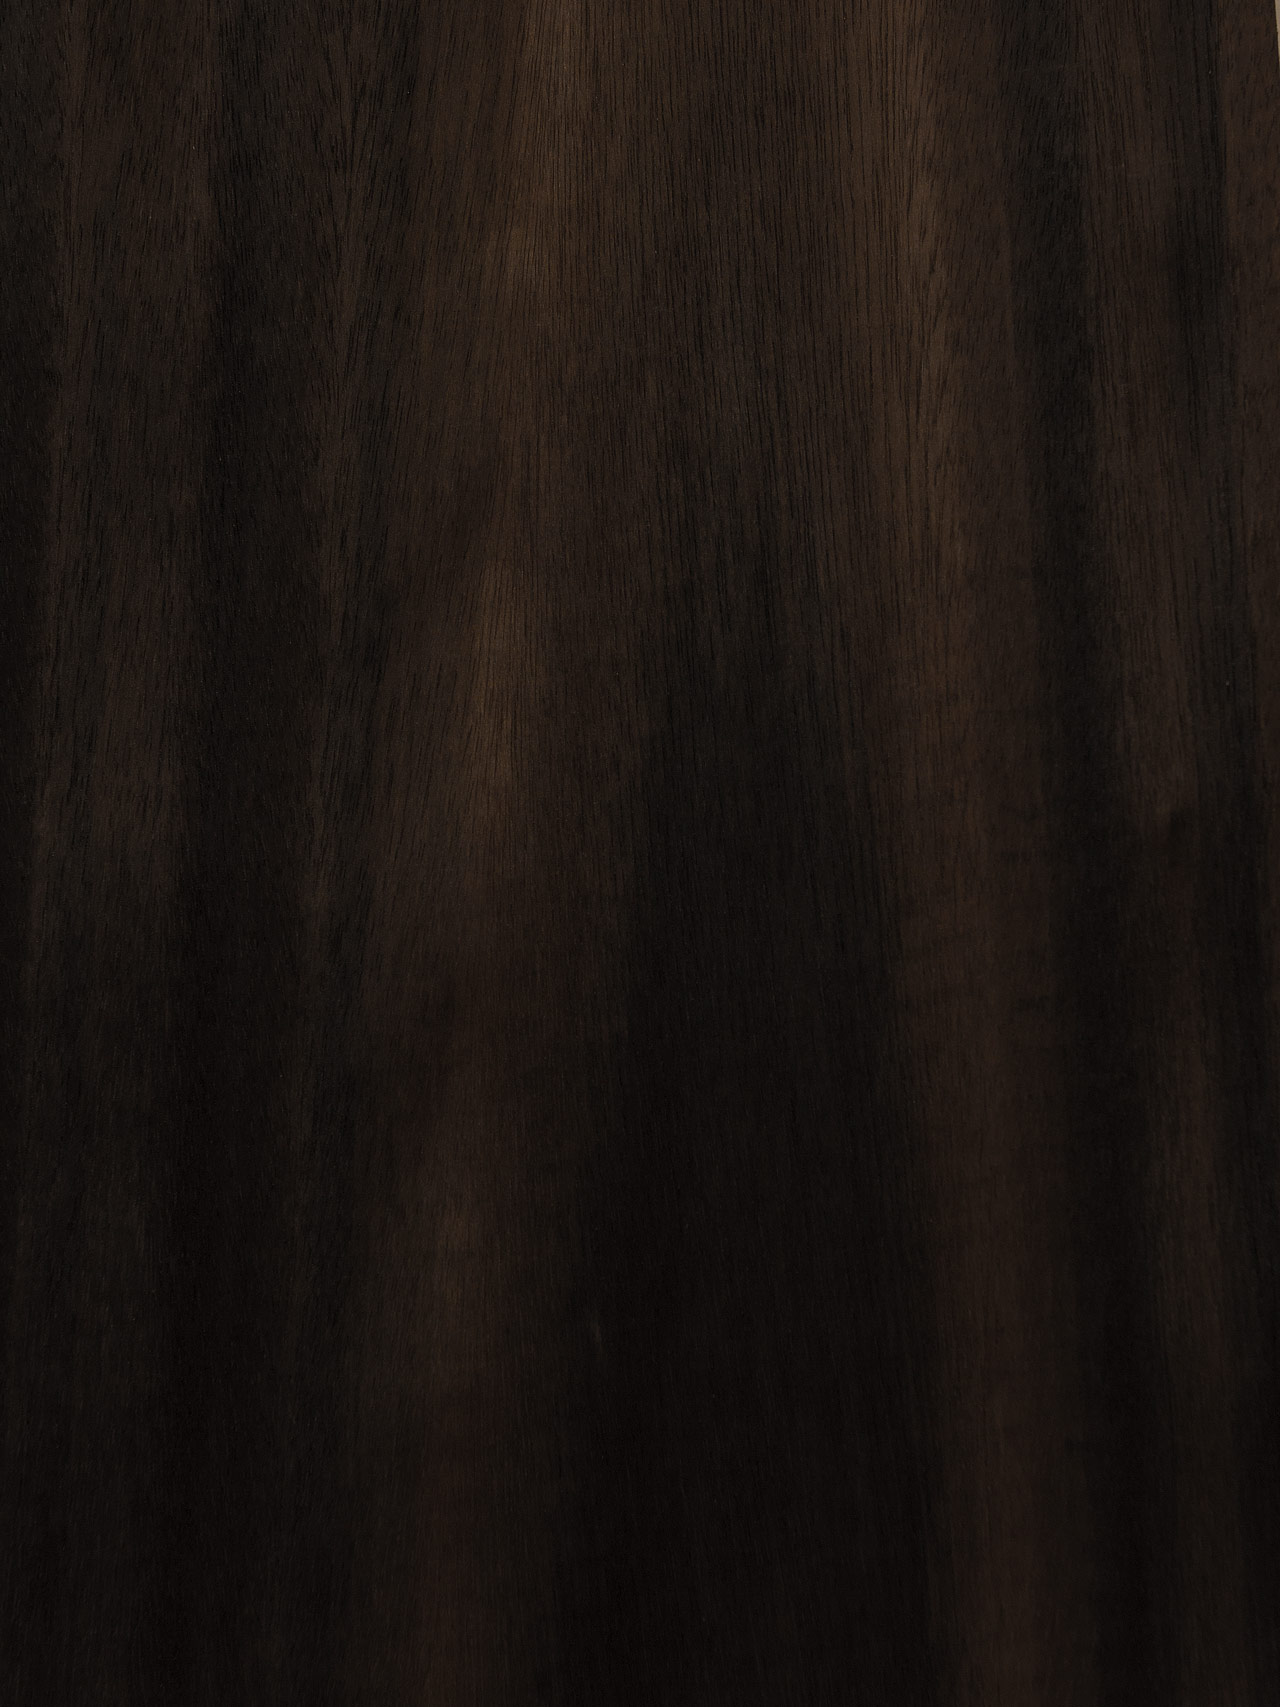 Chapa Eucalipto Rameado Ahumado Losán